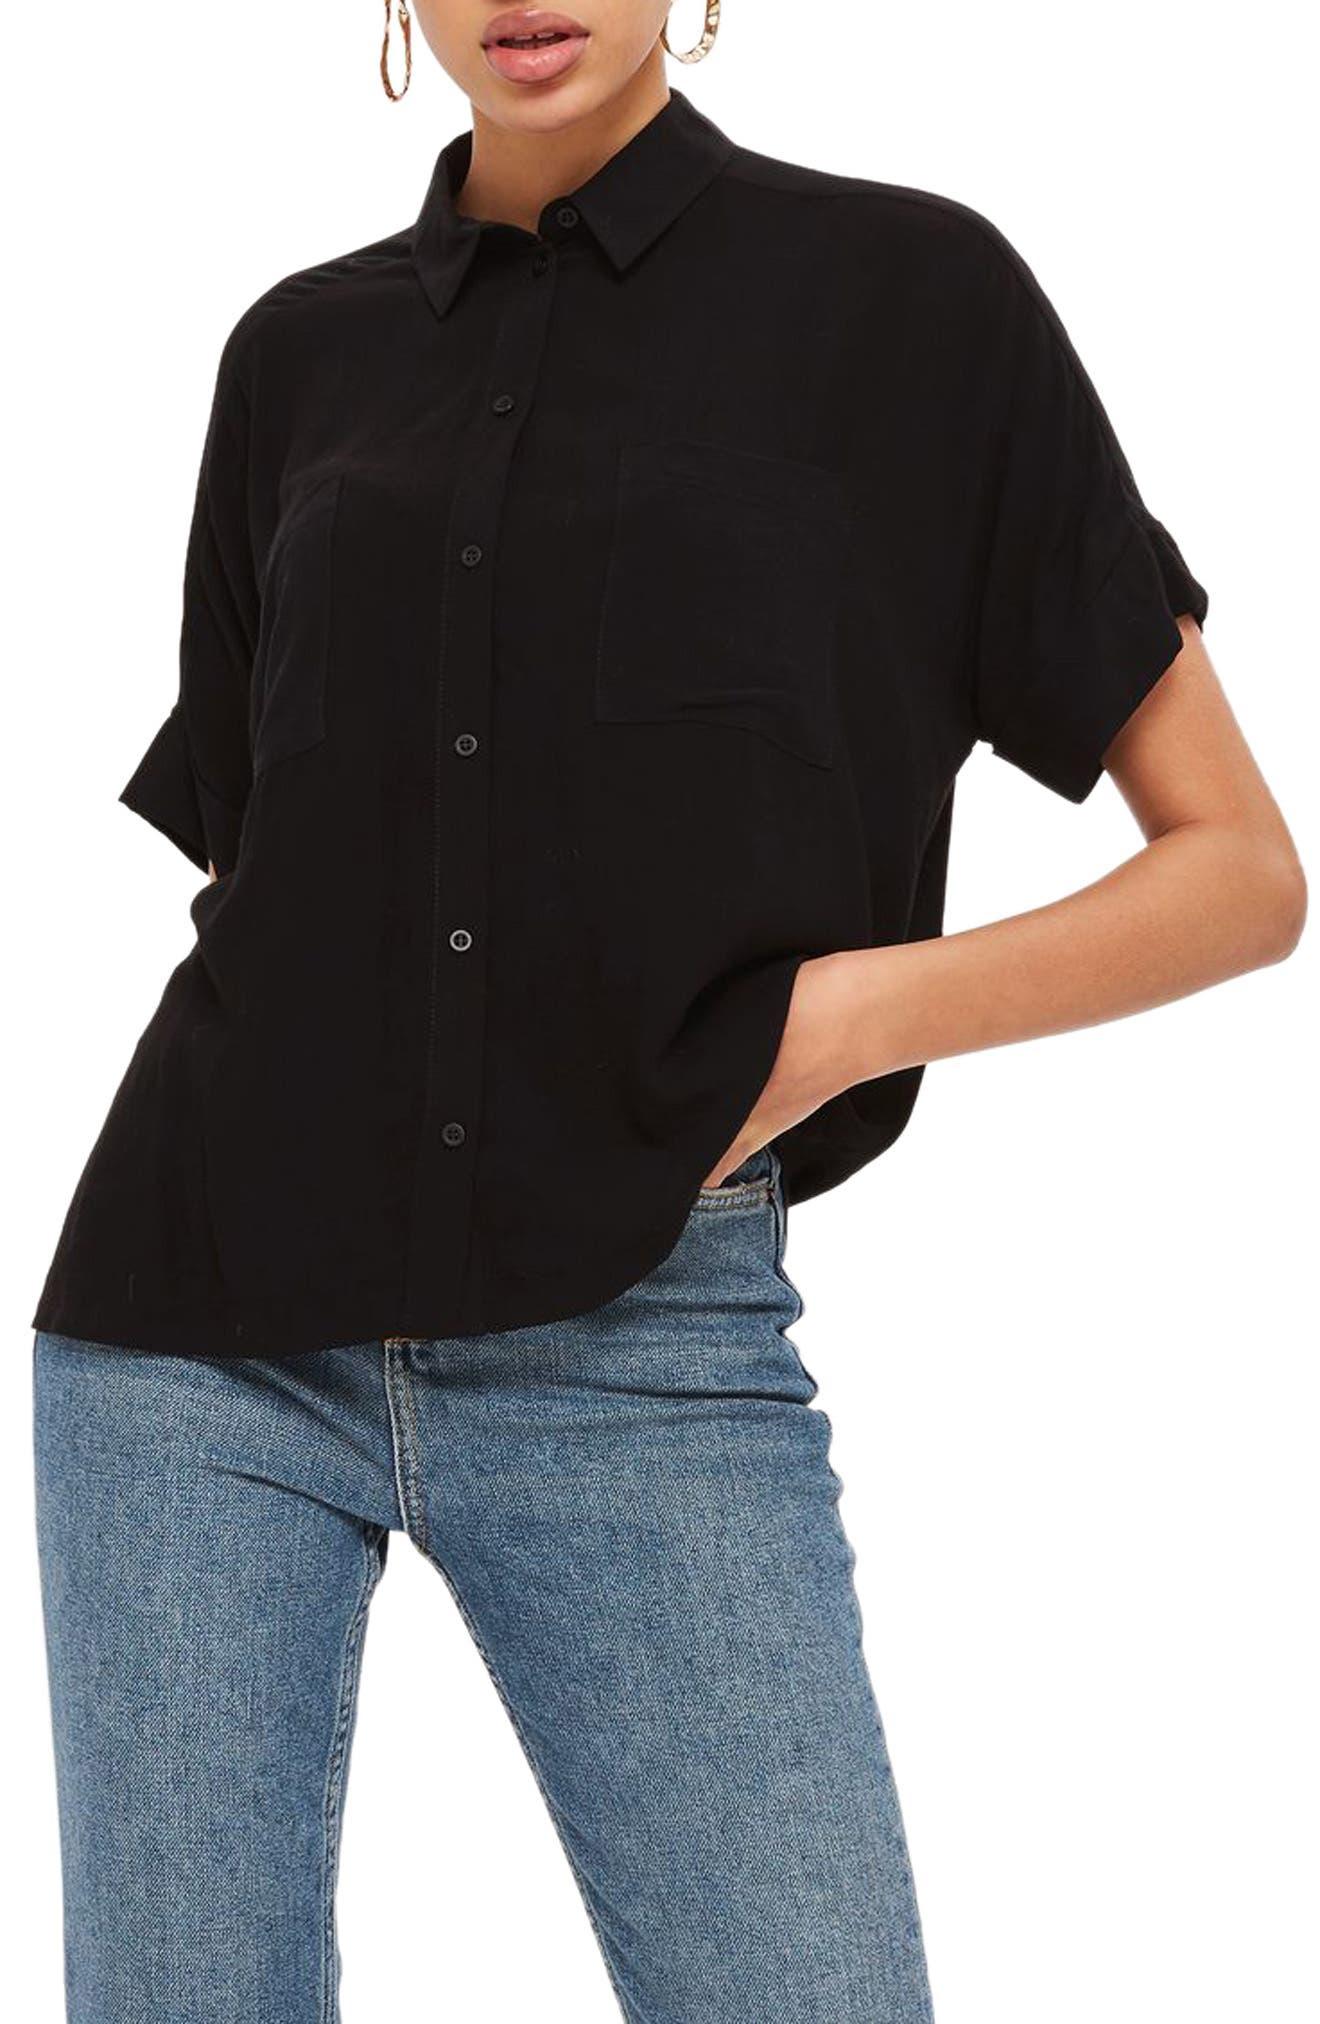 Topshop Joey Shirt